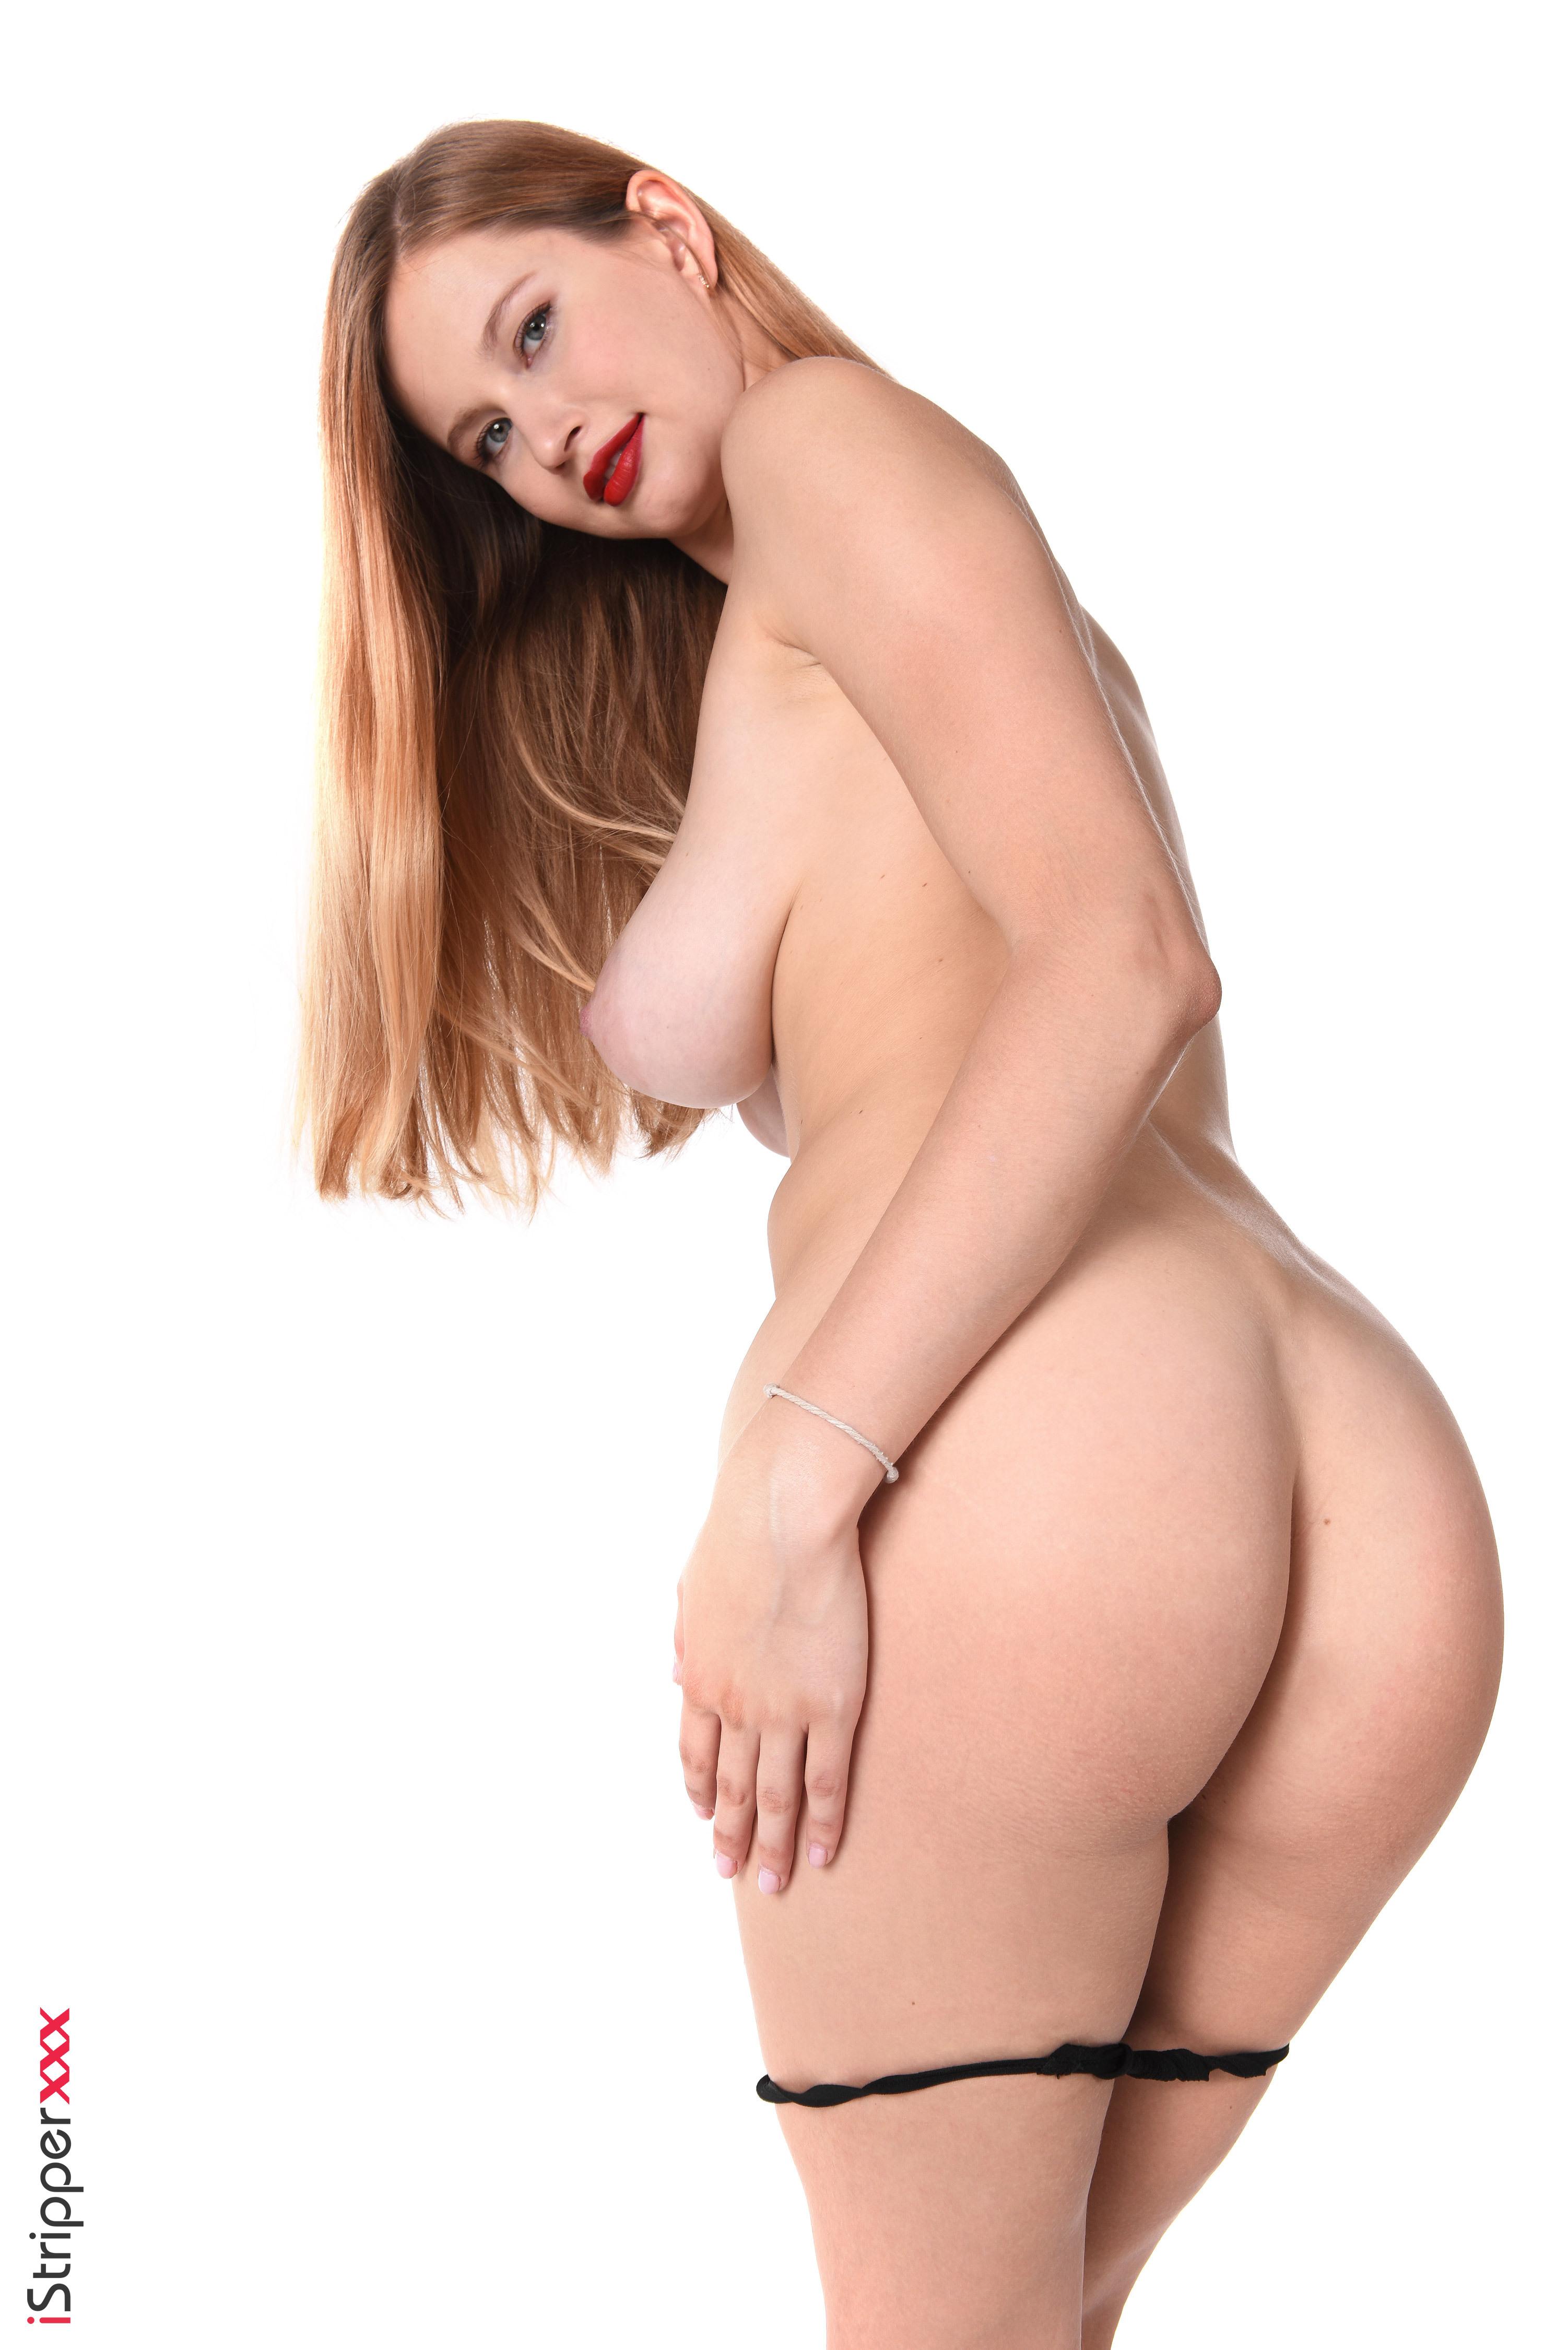 virtual stripper girlfriend